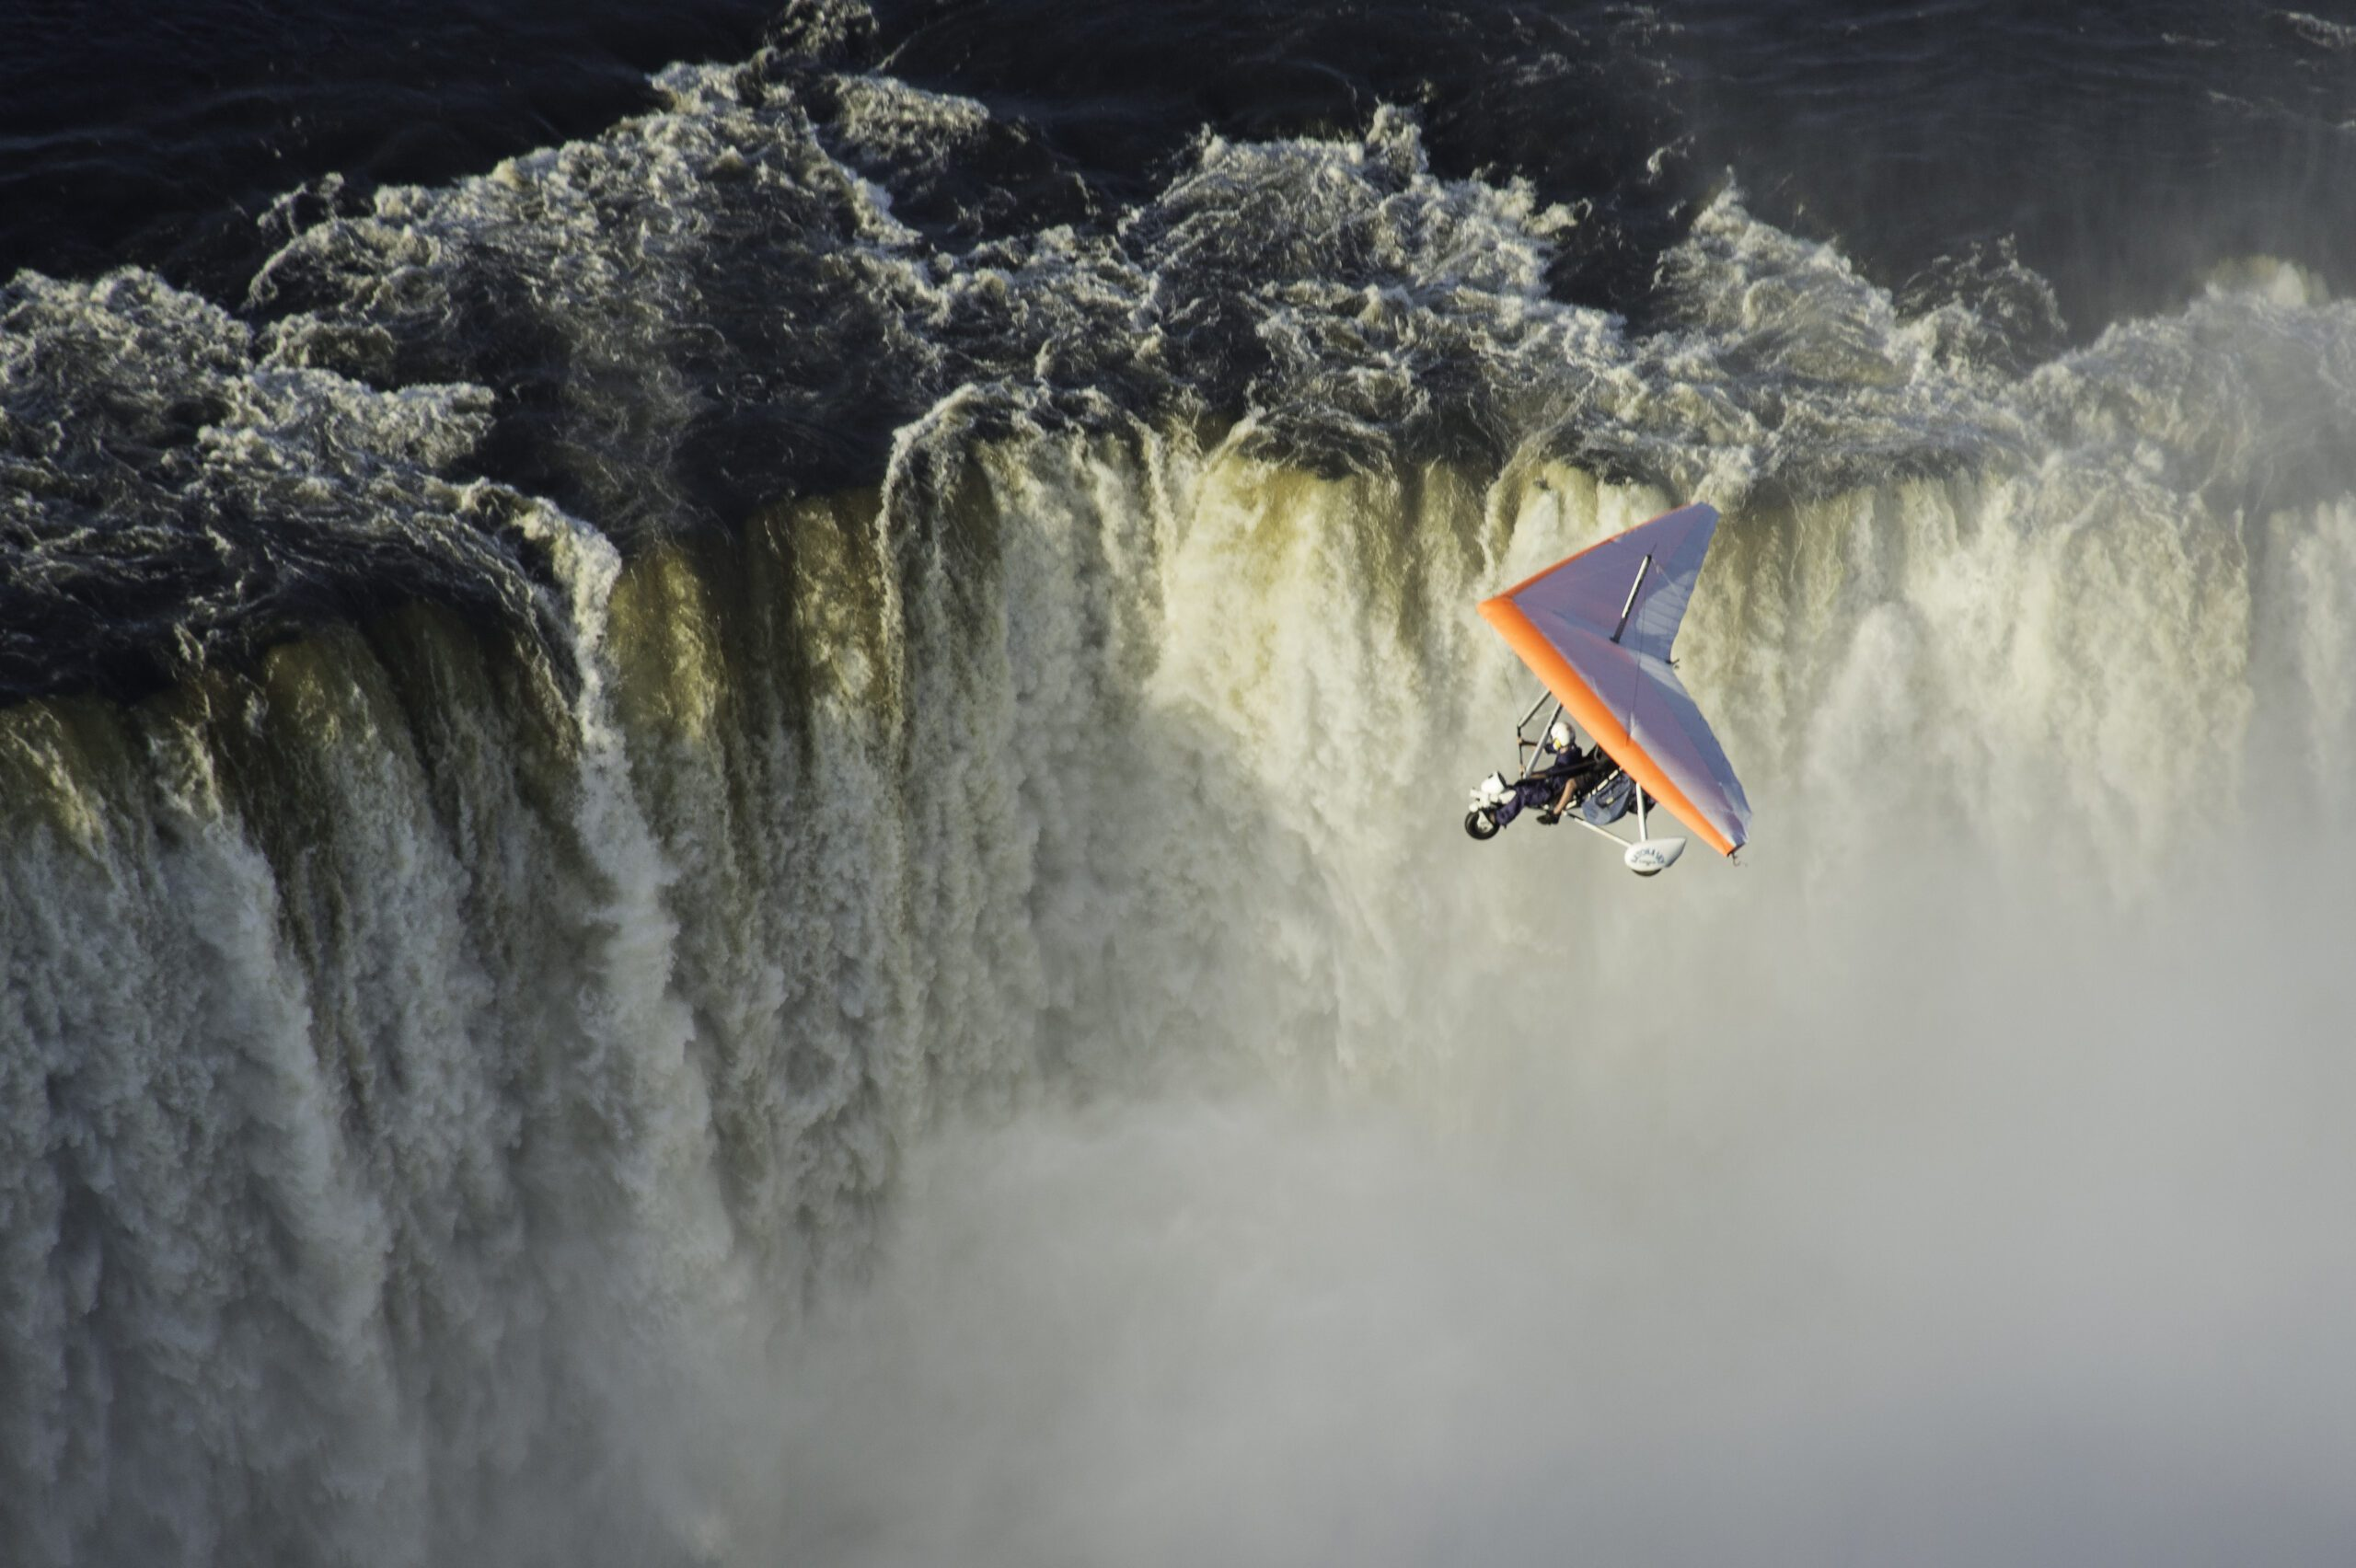 microlight flight over large waterfalls